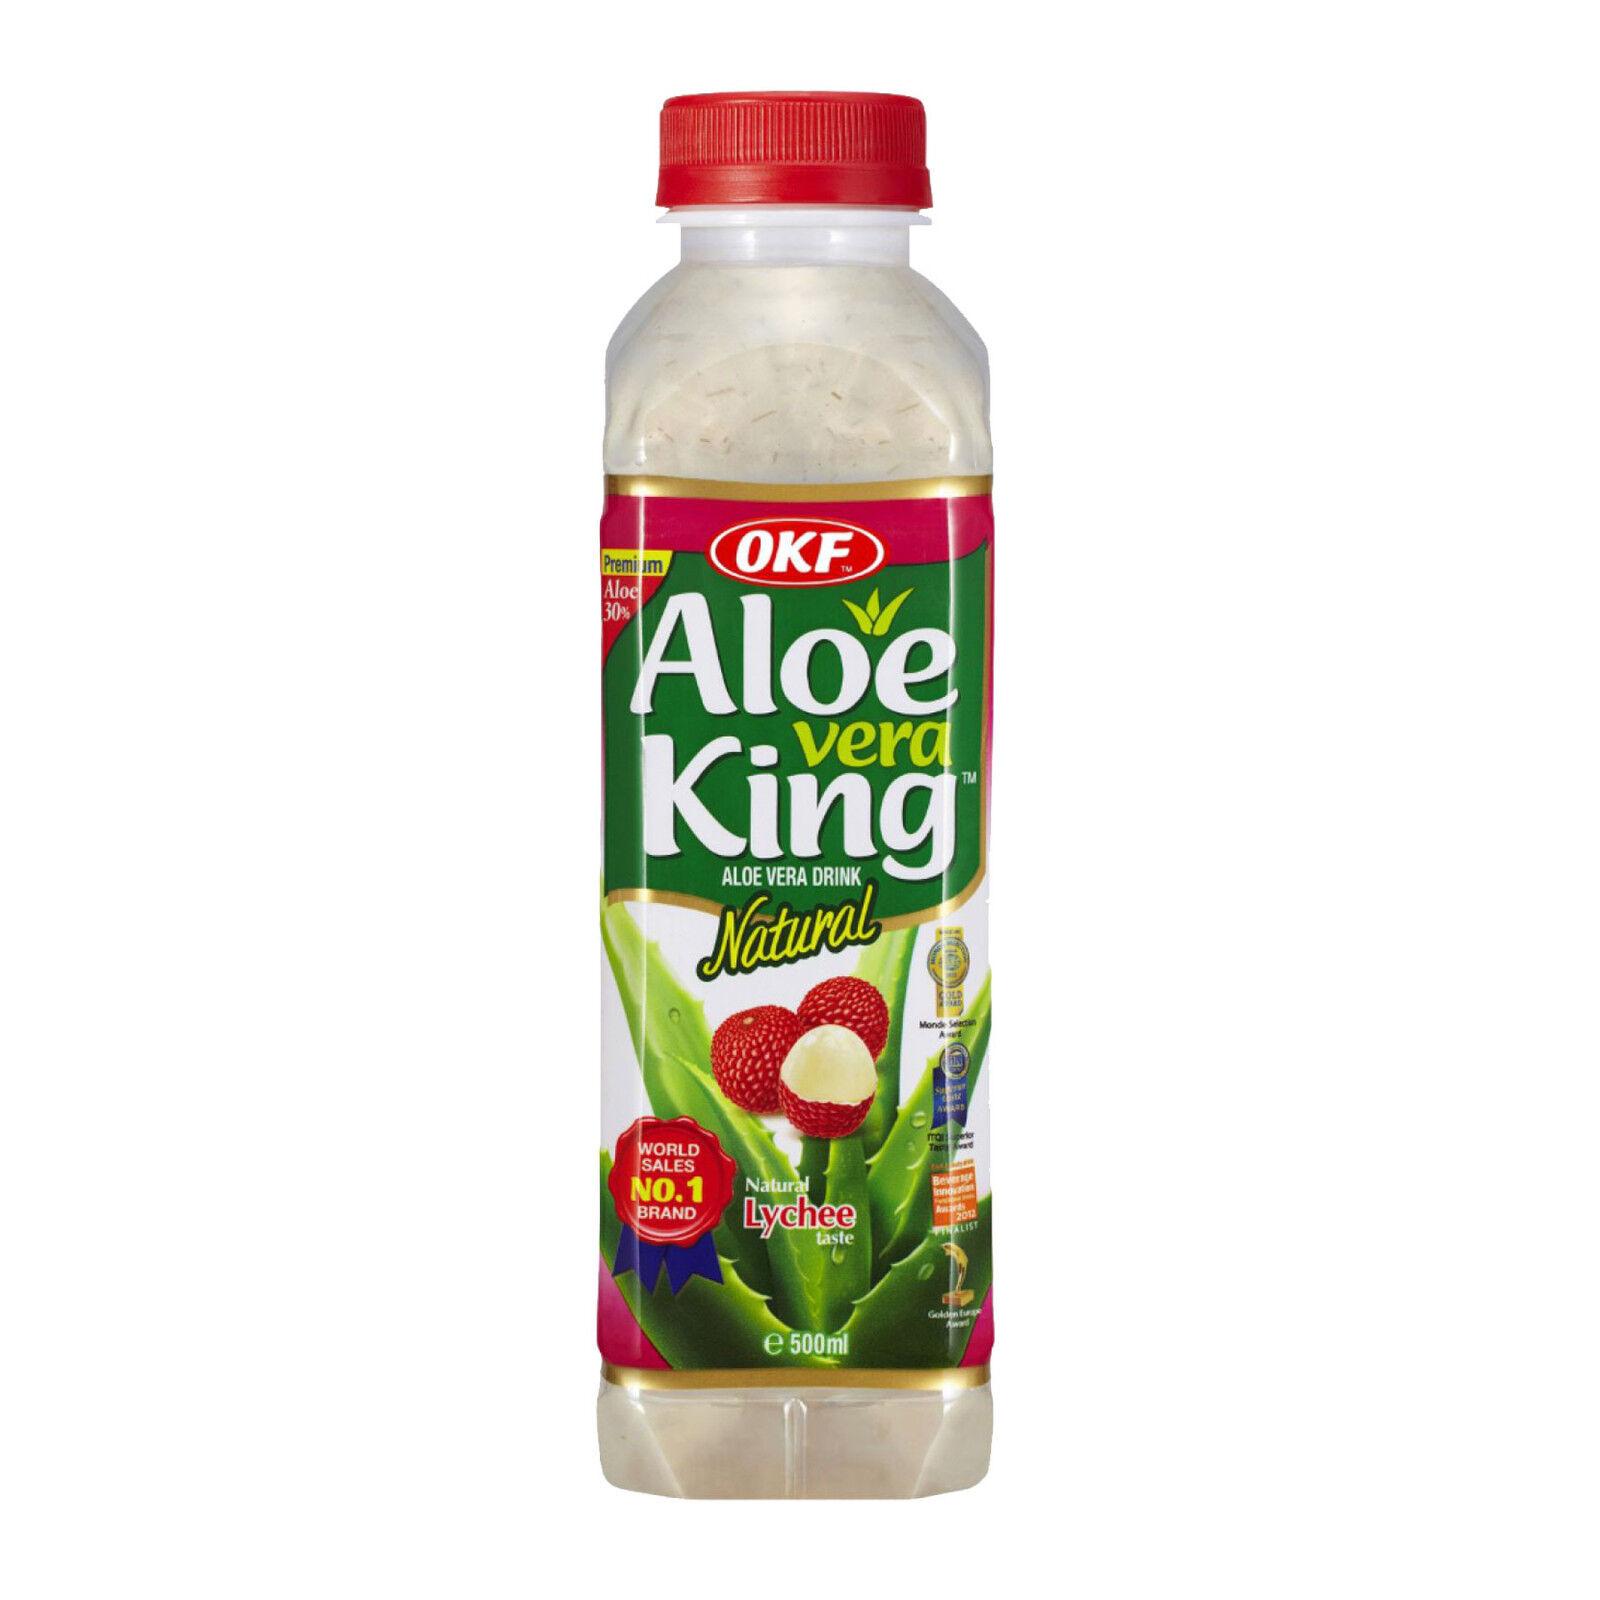 6 x 500ml OKF Aloe Vera King Original Litschi Aloe Vera Getränk Drink 3 L